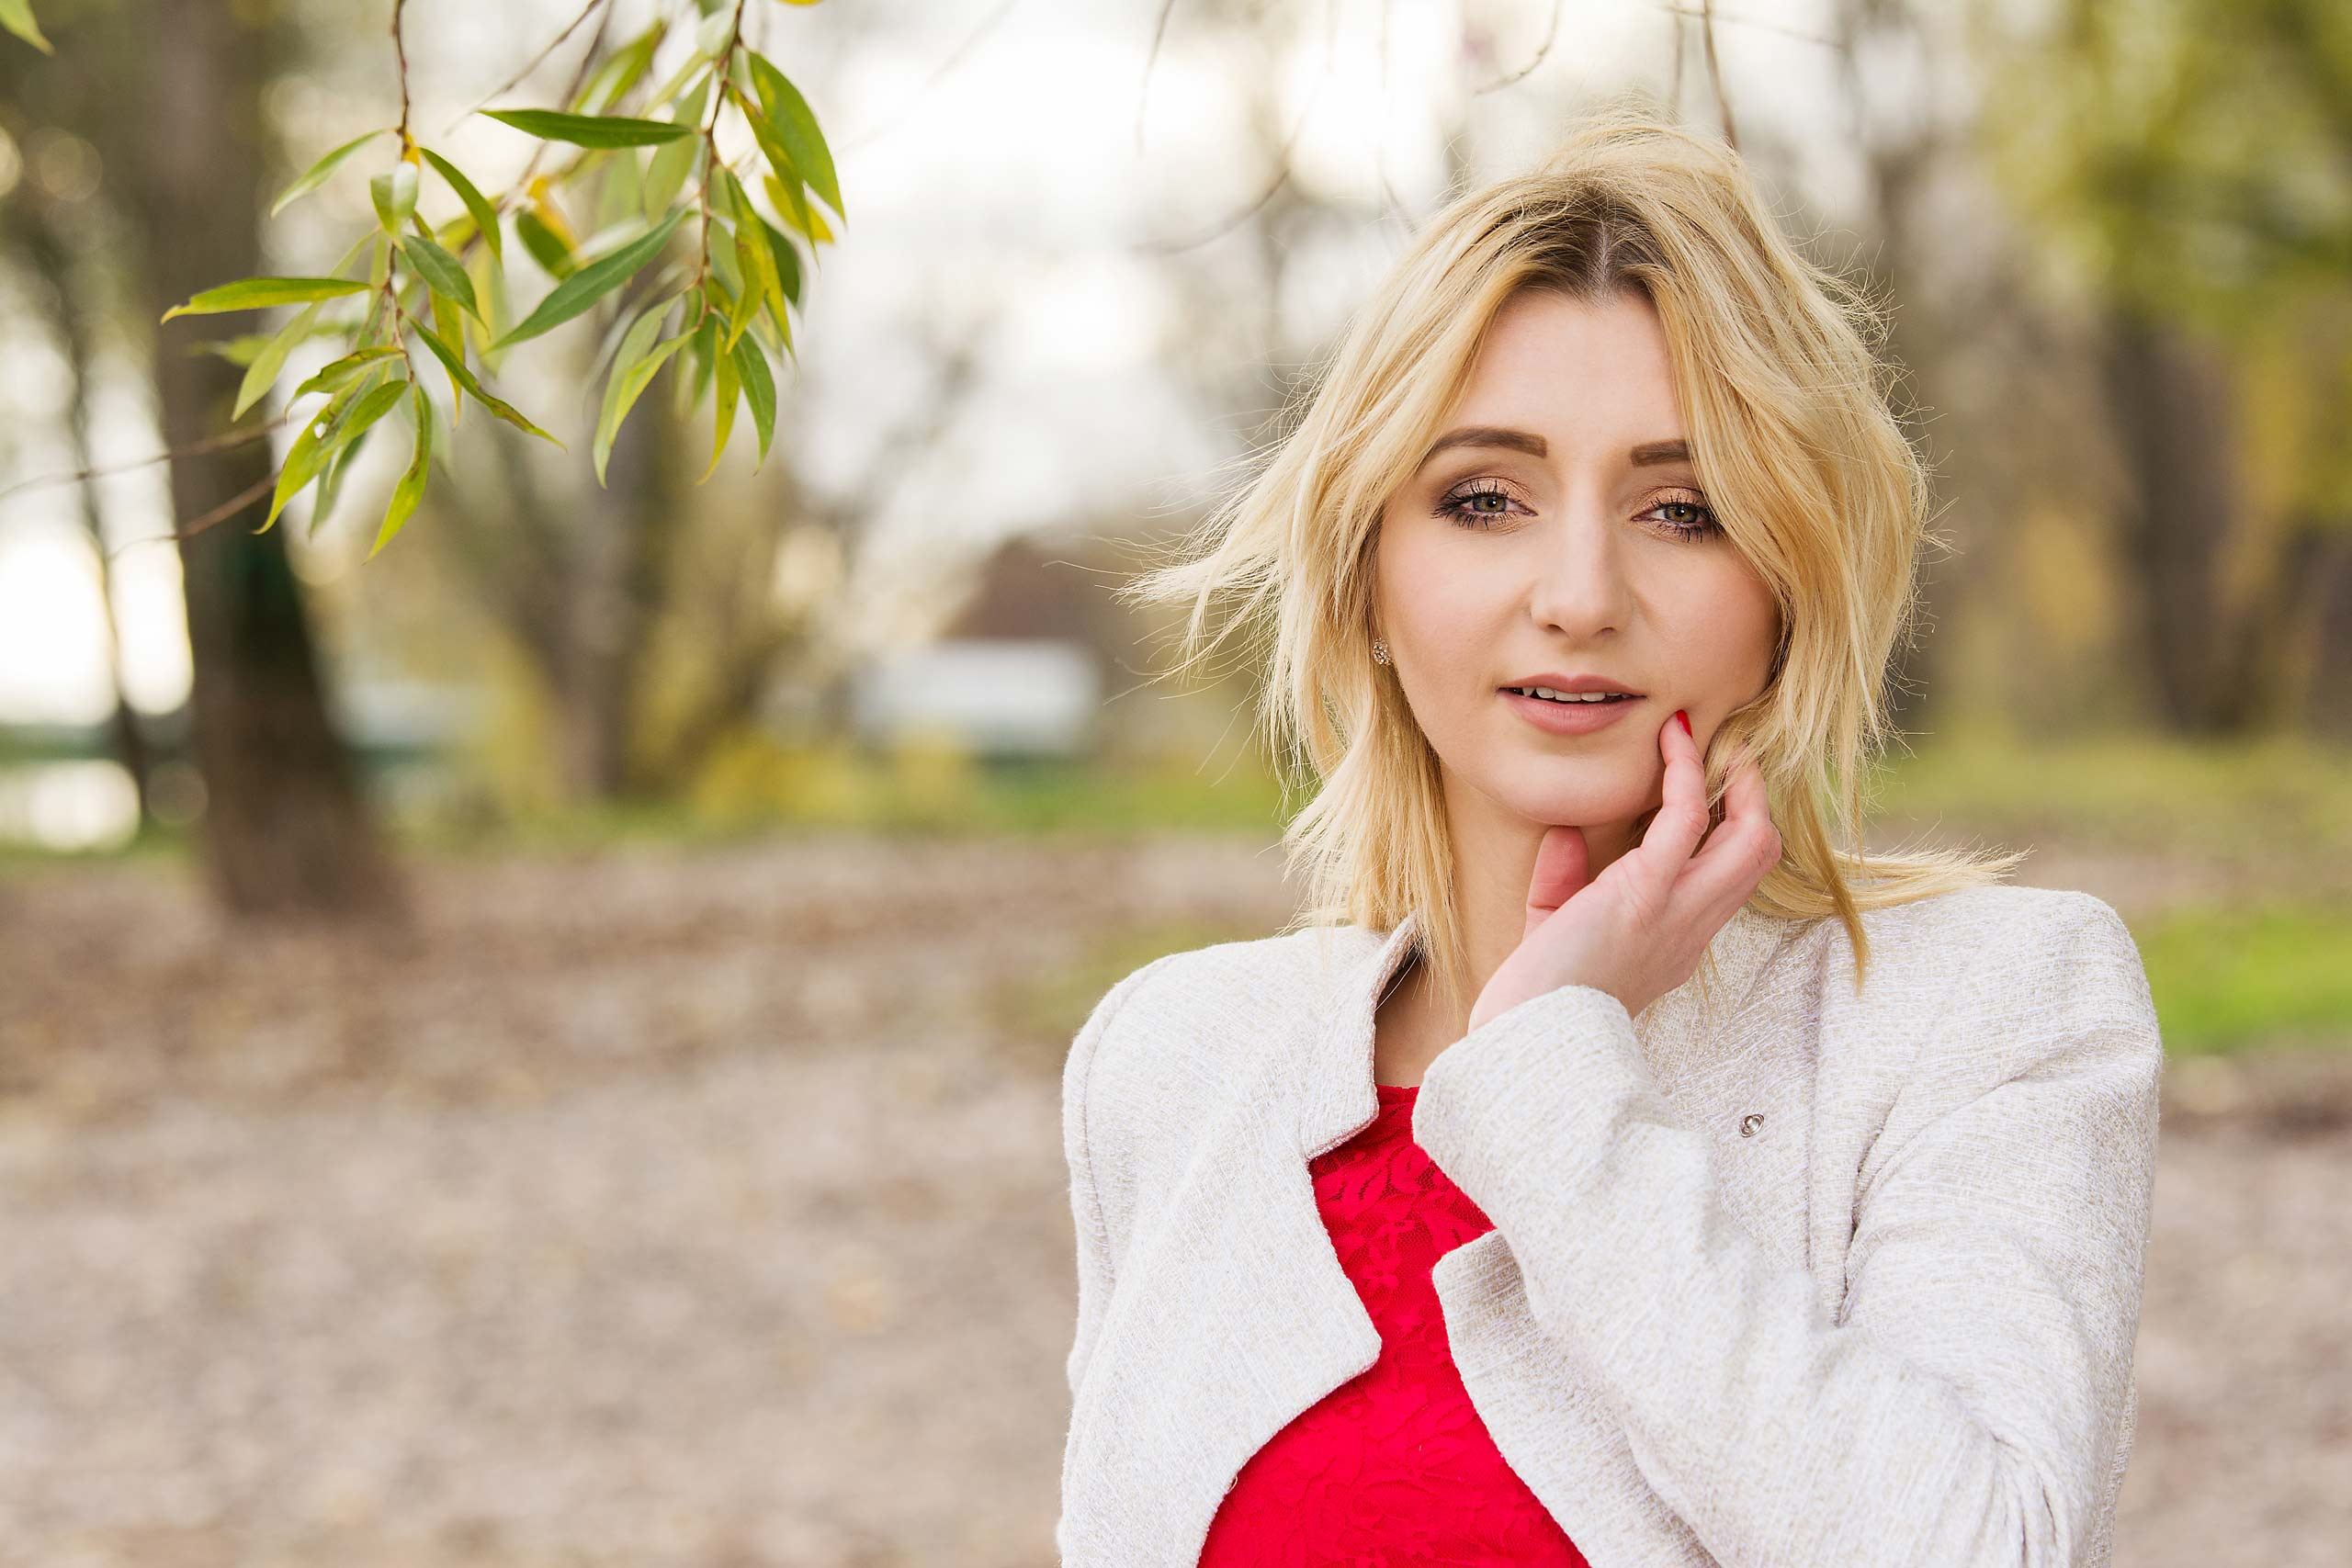 blonde Frau in Koeln FotoEdmundo